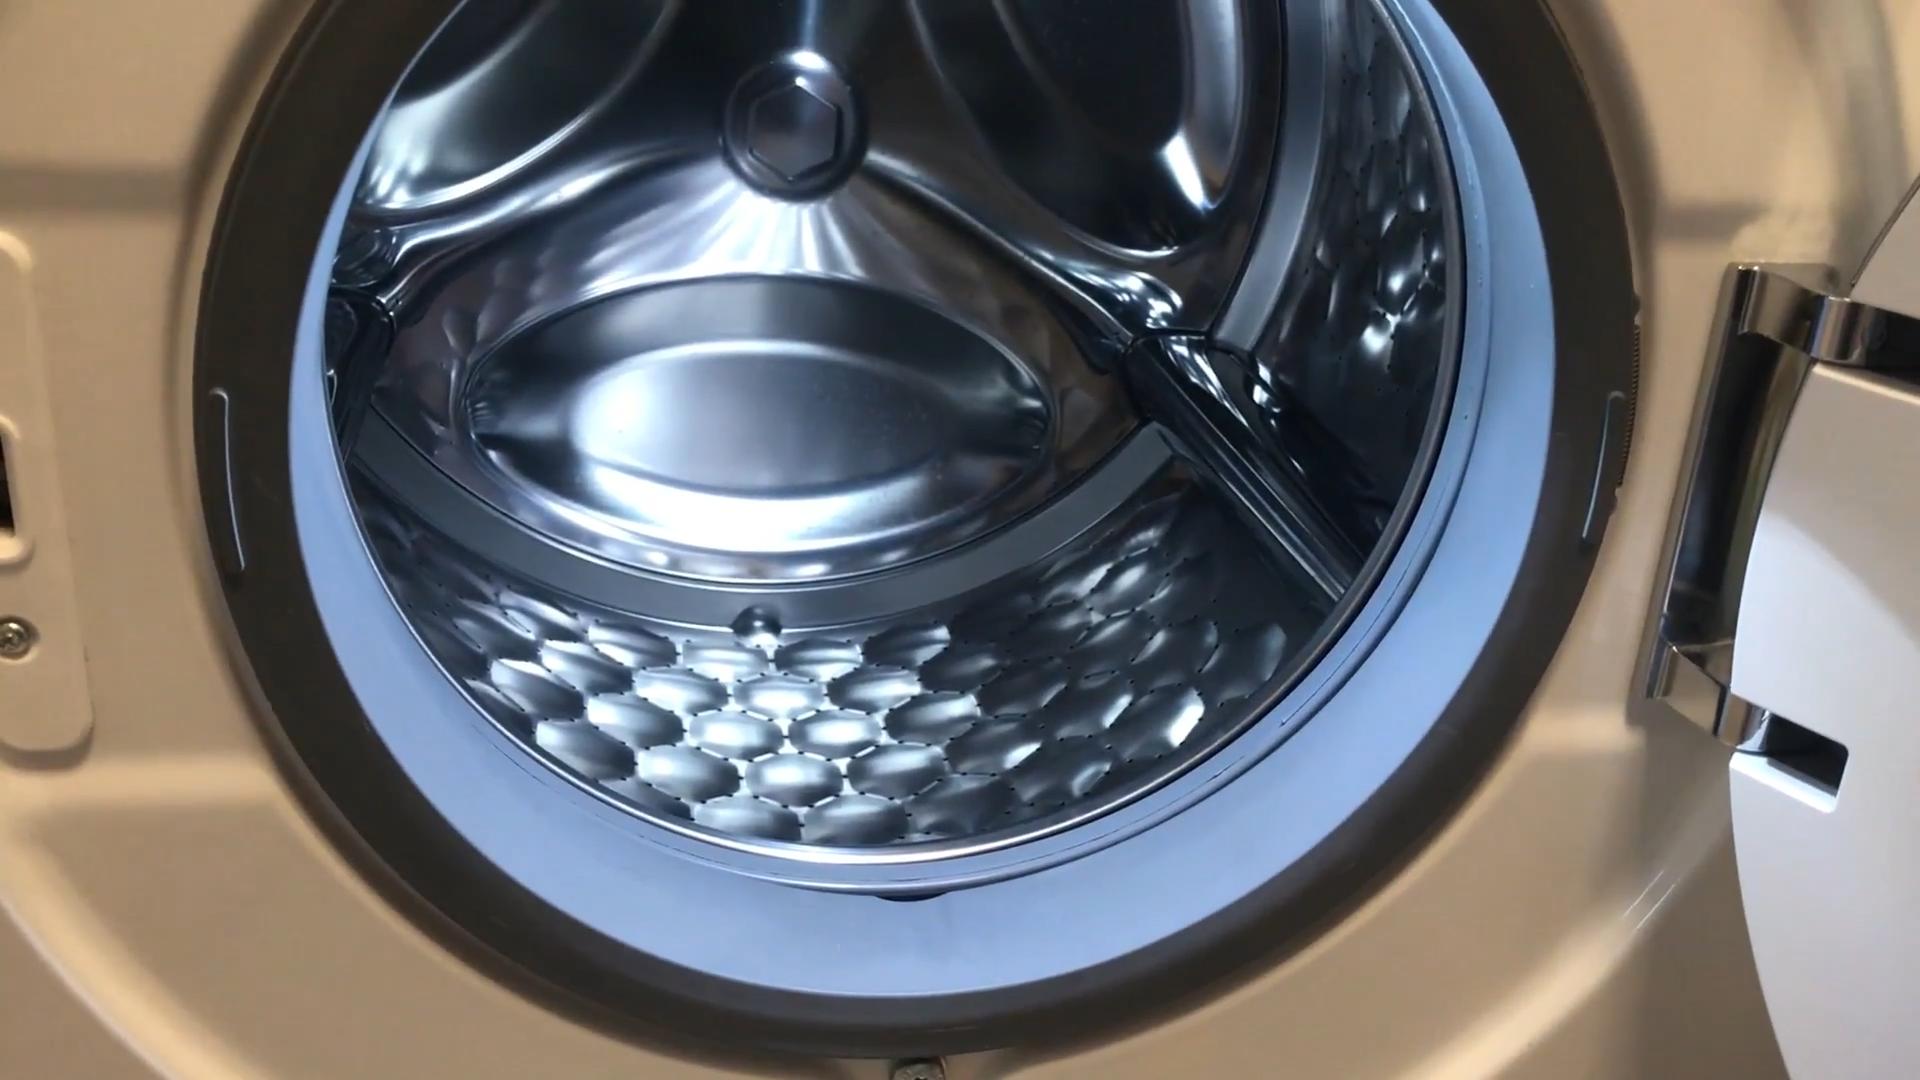 Washing Machine Squeaking Noise When Agitating Industrial Washing Machines Antique Washing Machine Washing Machine